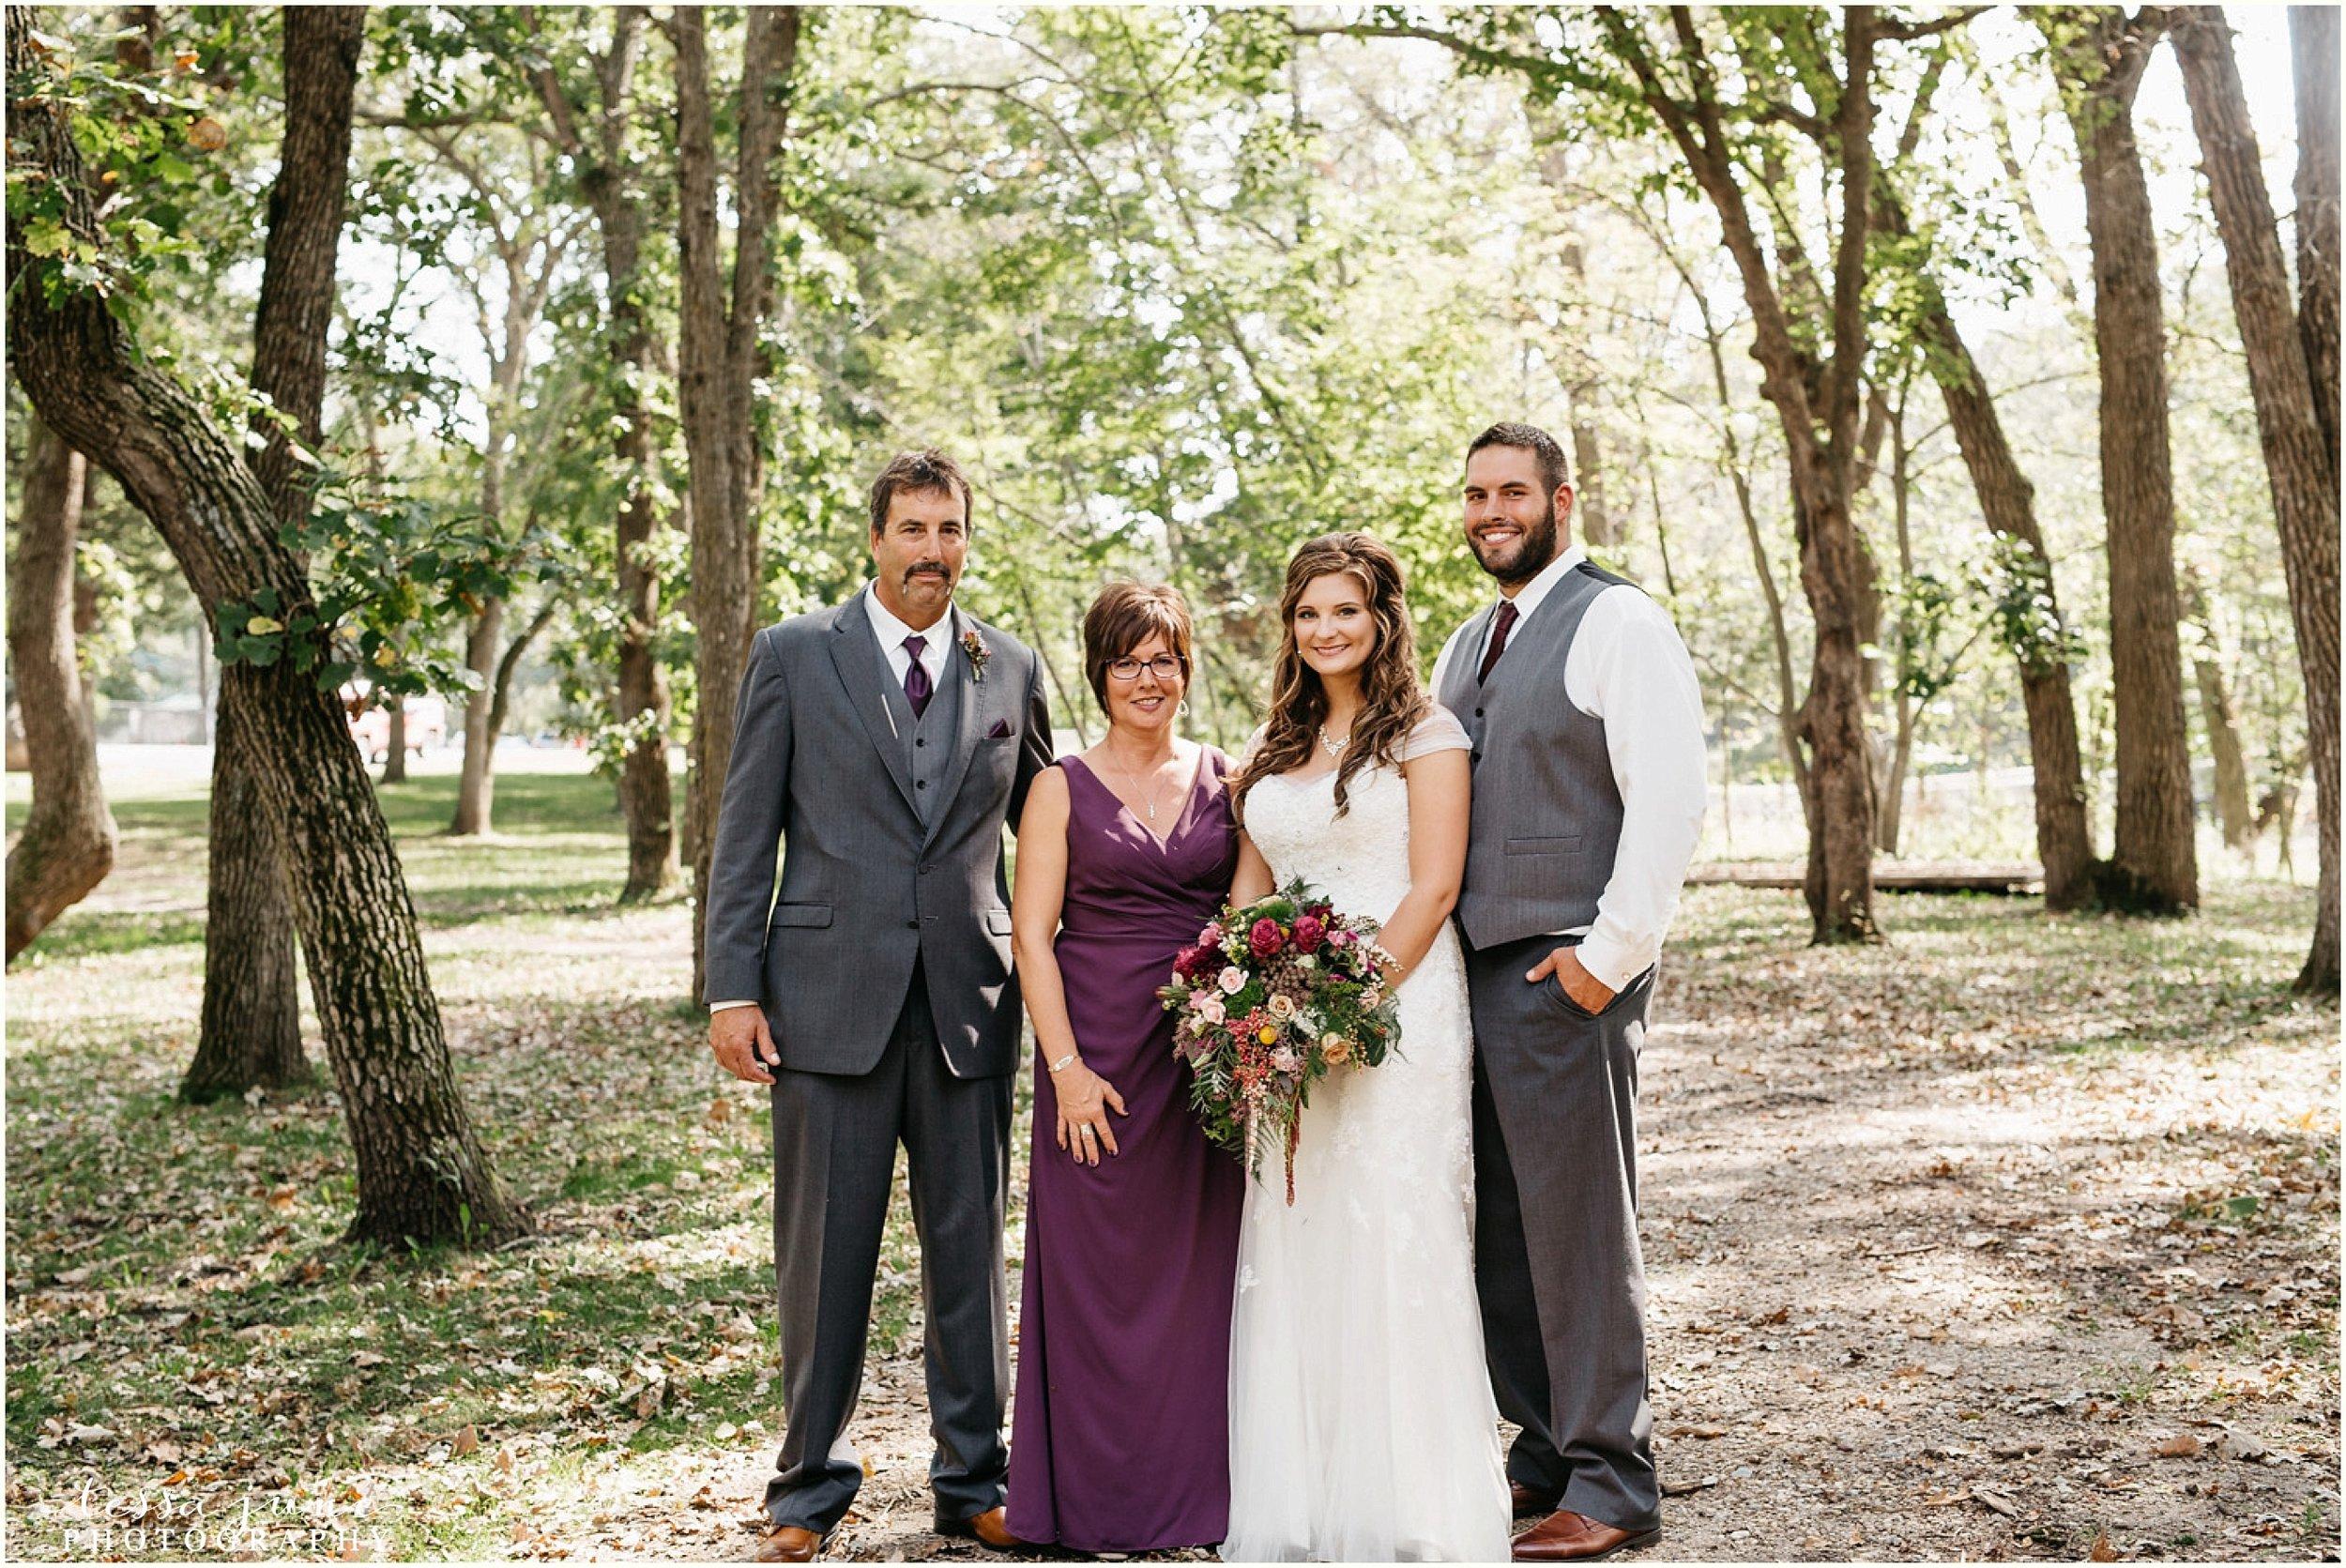 bohemian-minnesota-wedding-mismatched-bridesmaid-dresses-waterfall-st-cloud-tessa-june-photography-94.jpg